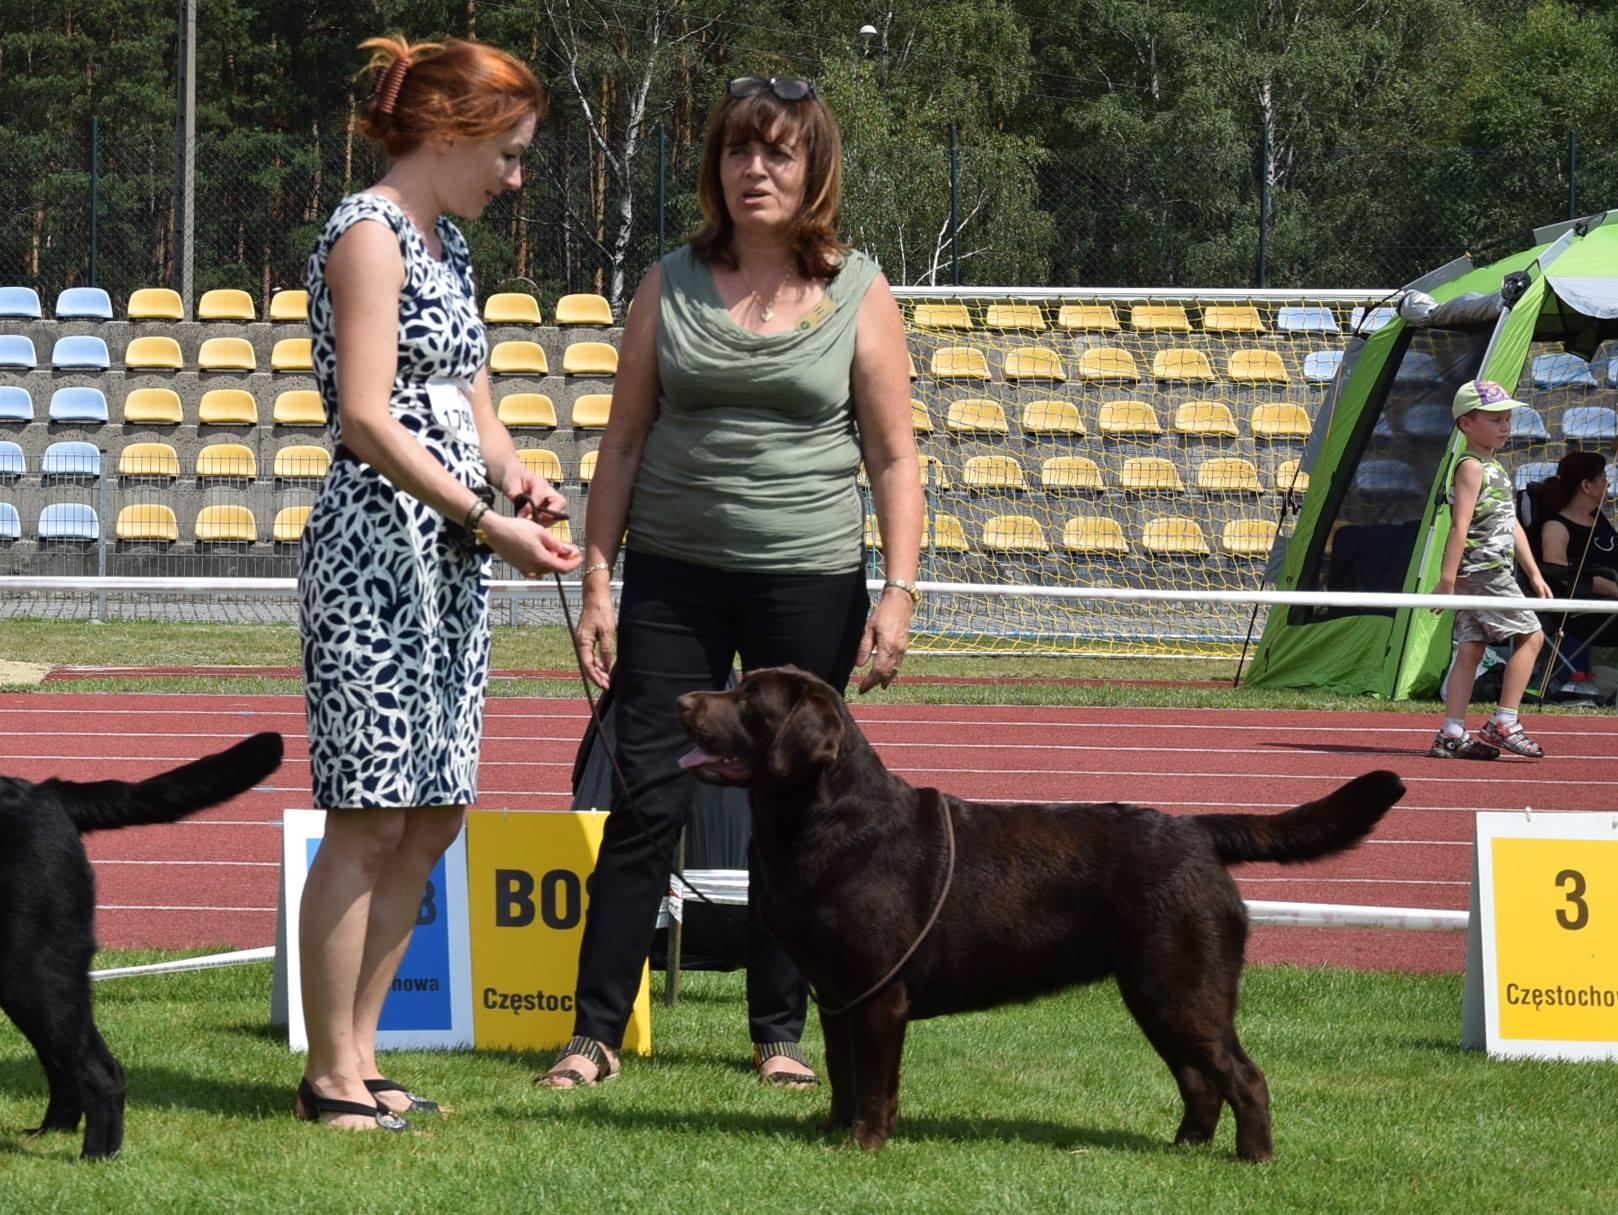 International Dog Show in Częstochowa 22.07.2017 - open class, 1st, CAC, Cacib ,Best Female, BOS